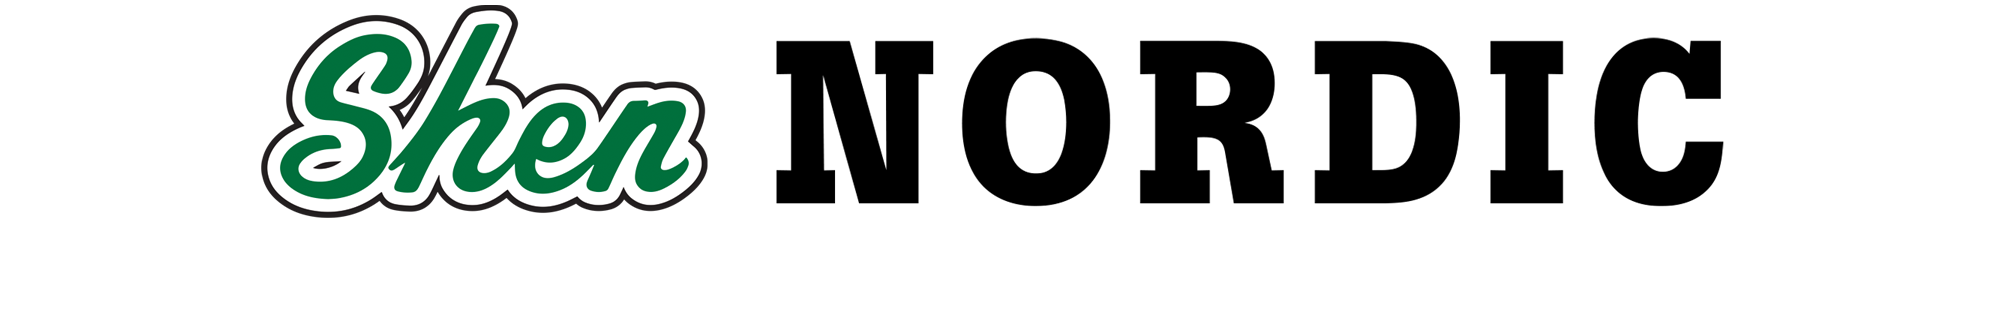 Shen-NORDIC-logo-white-BG.png